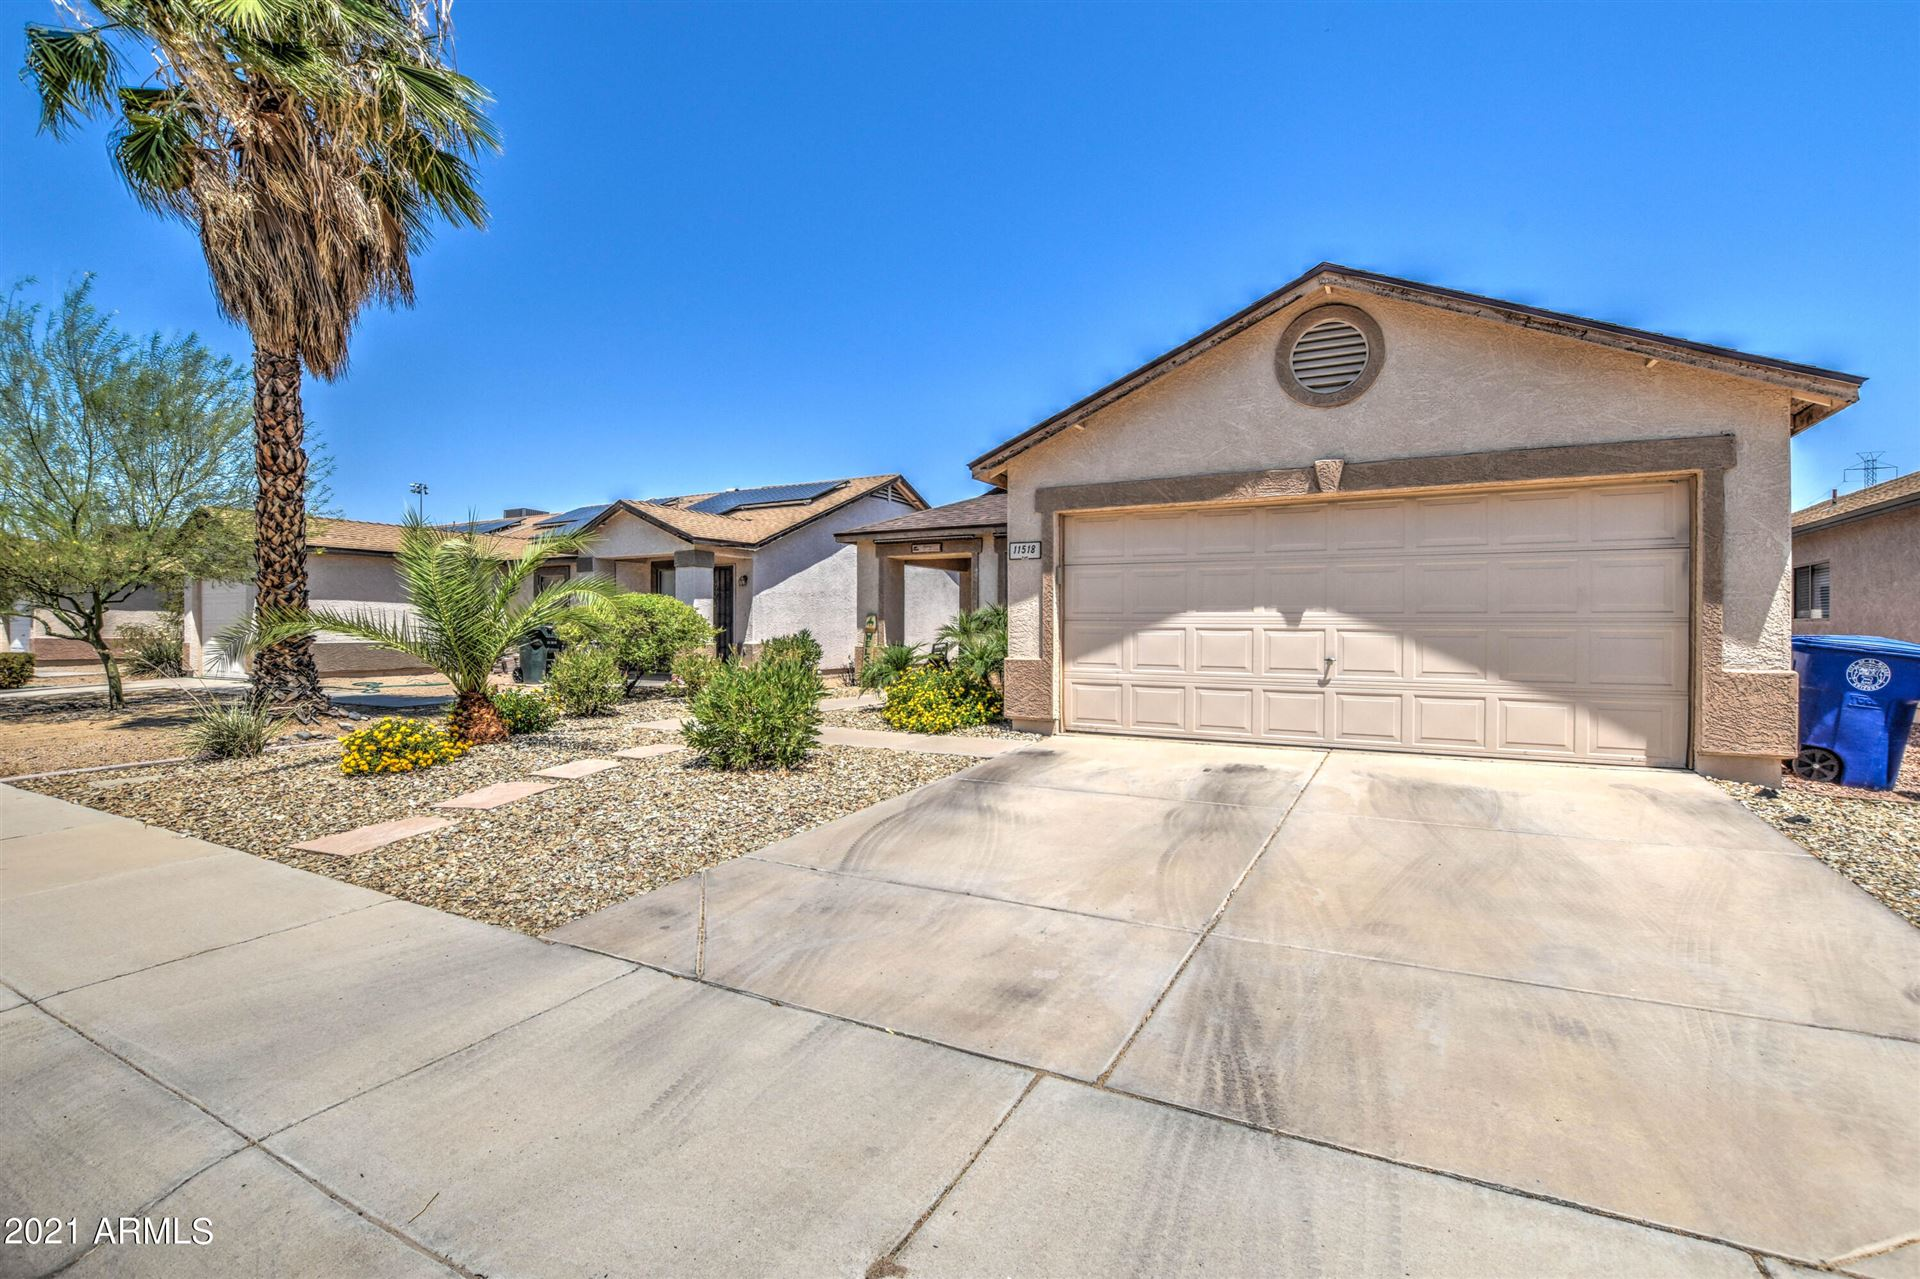 Photo of 11518 W LARKSPUR Road, El Mirage, AZ 85335 (MLS # 6263294)